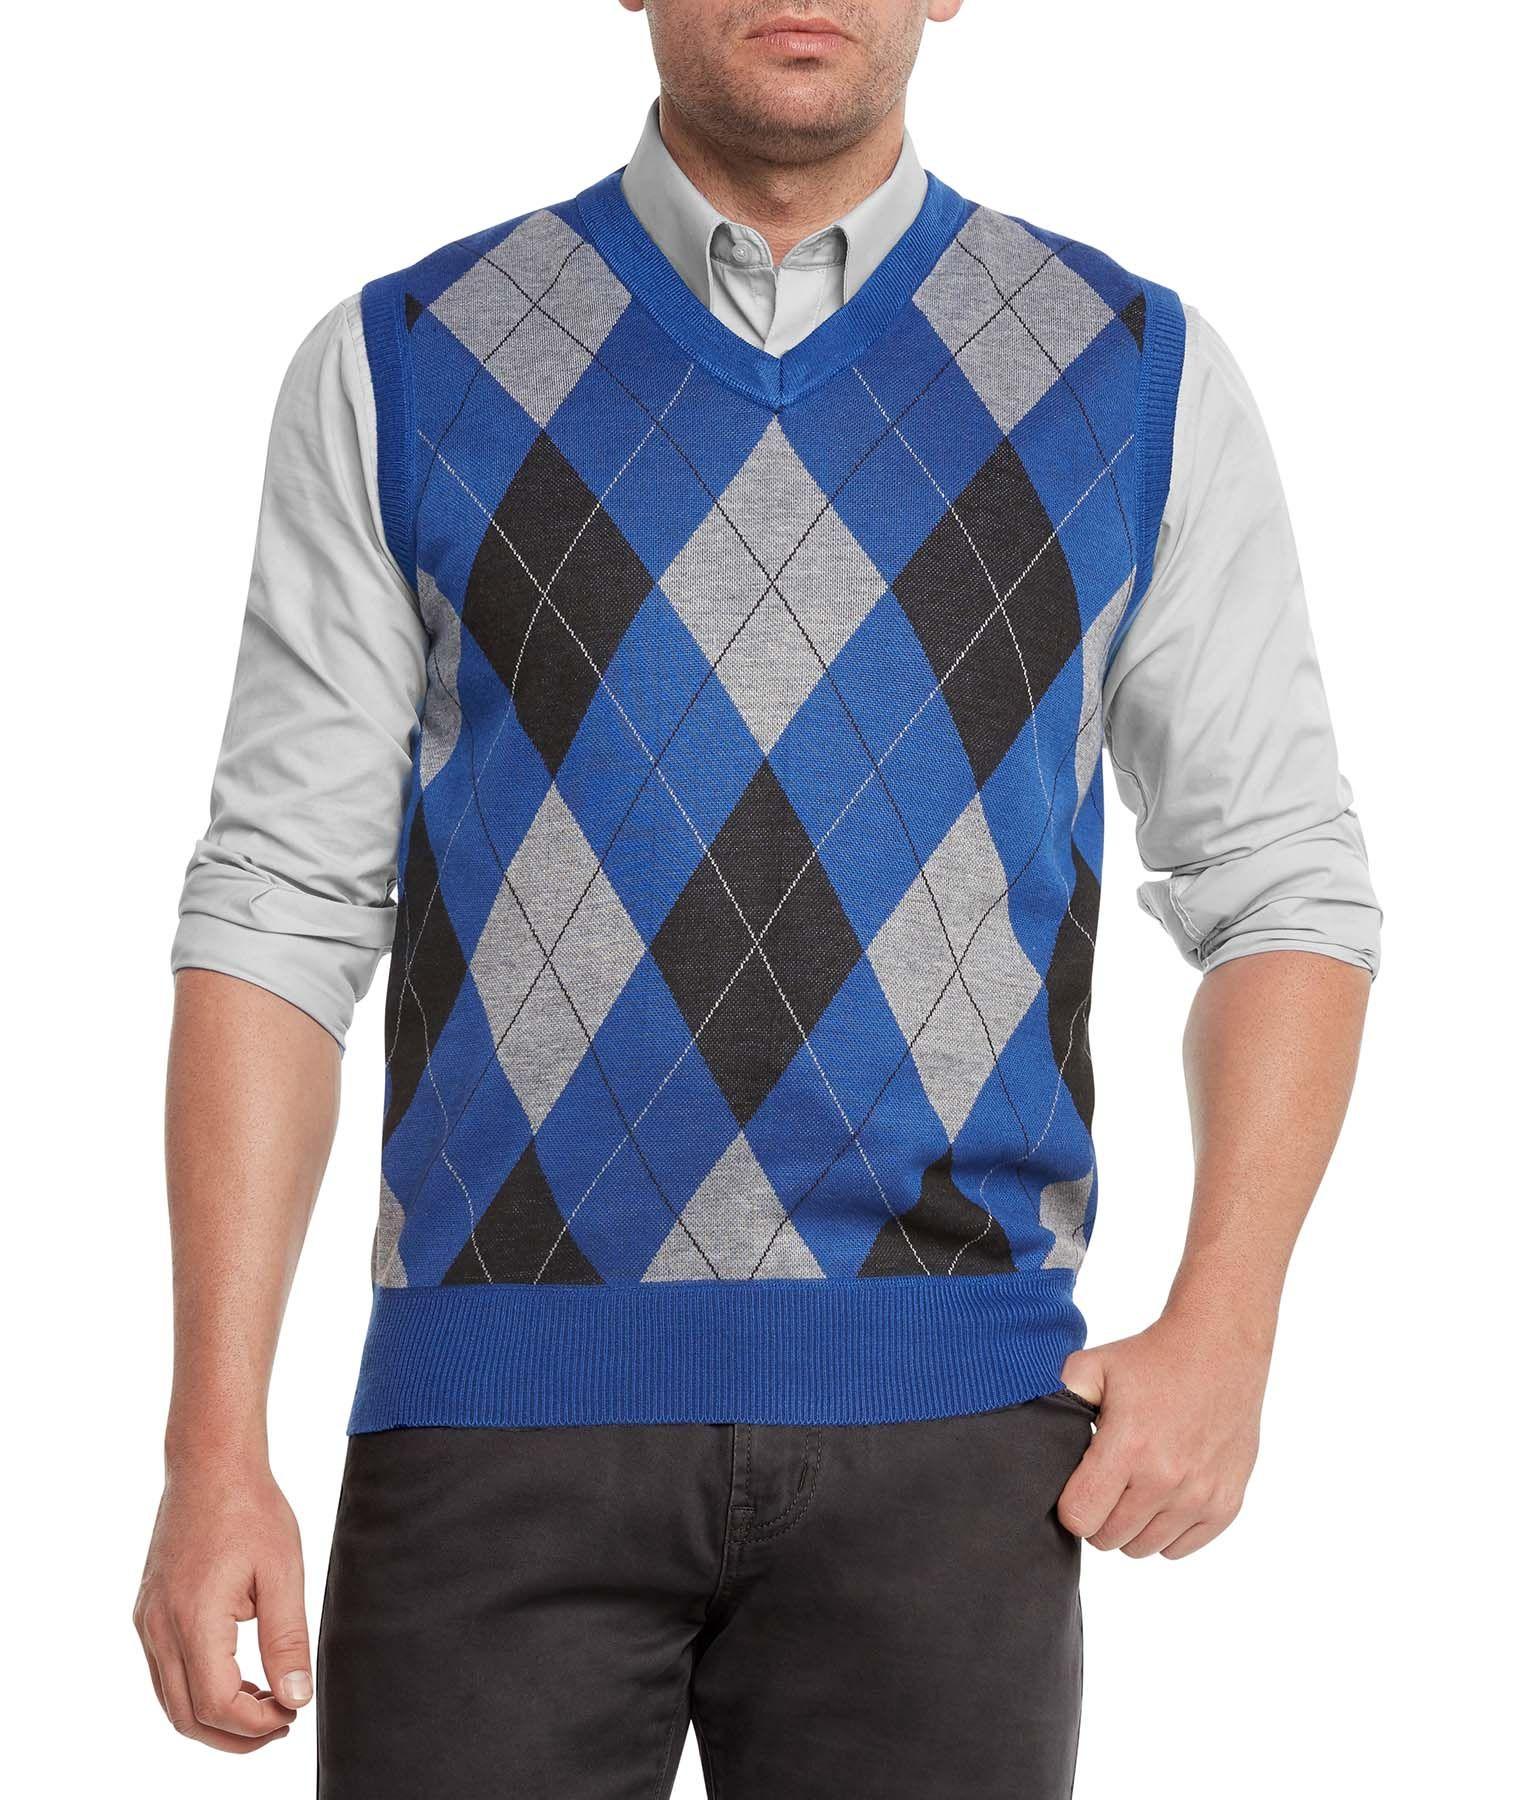 a15dd862c Free Shipping. Buy True Rock Men s Argyle V-Neck Sweater Vest at ...